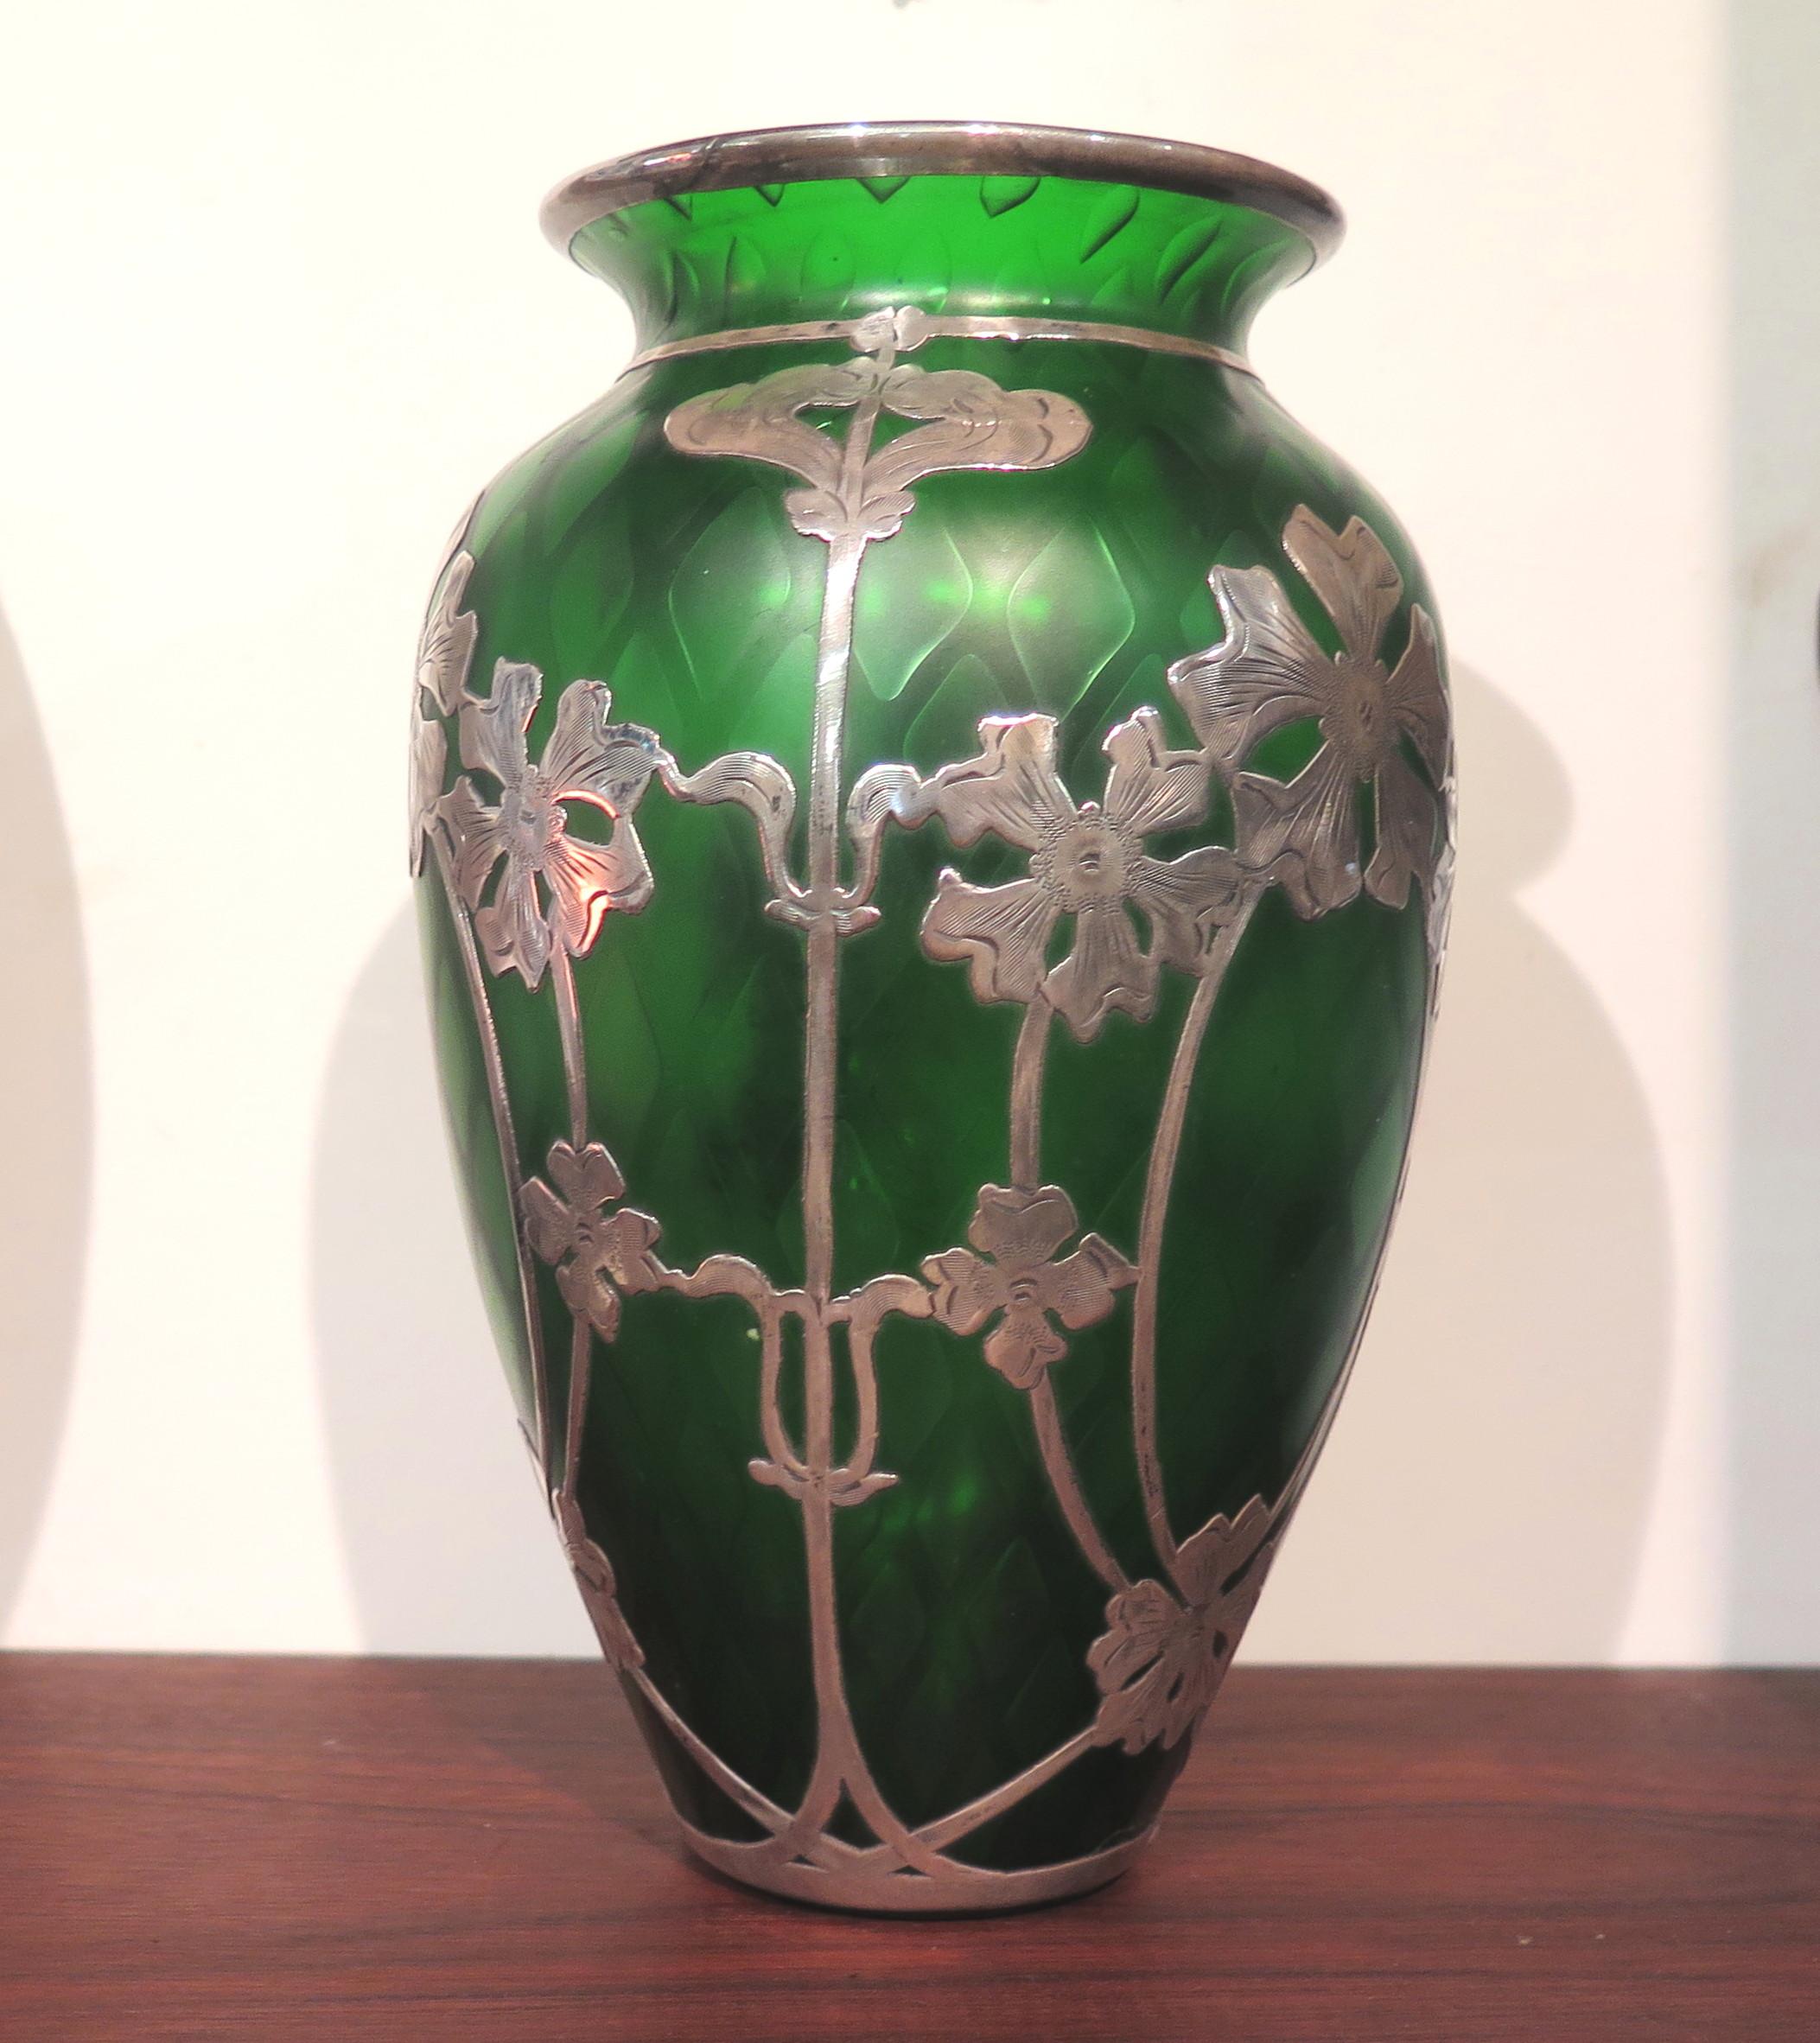 company store green vase.jpg